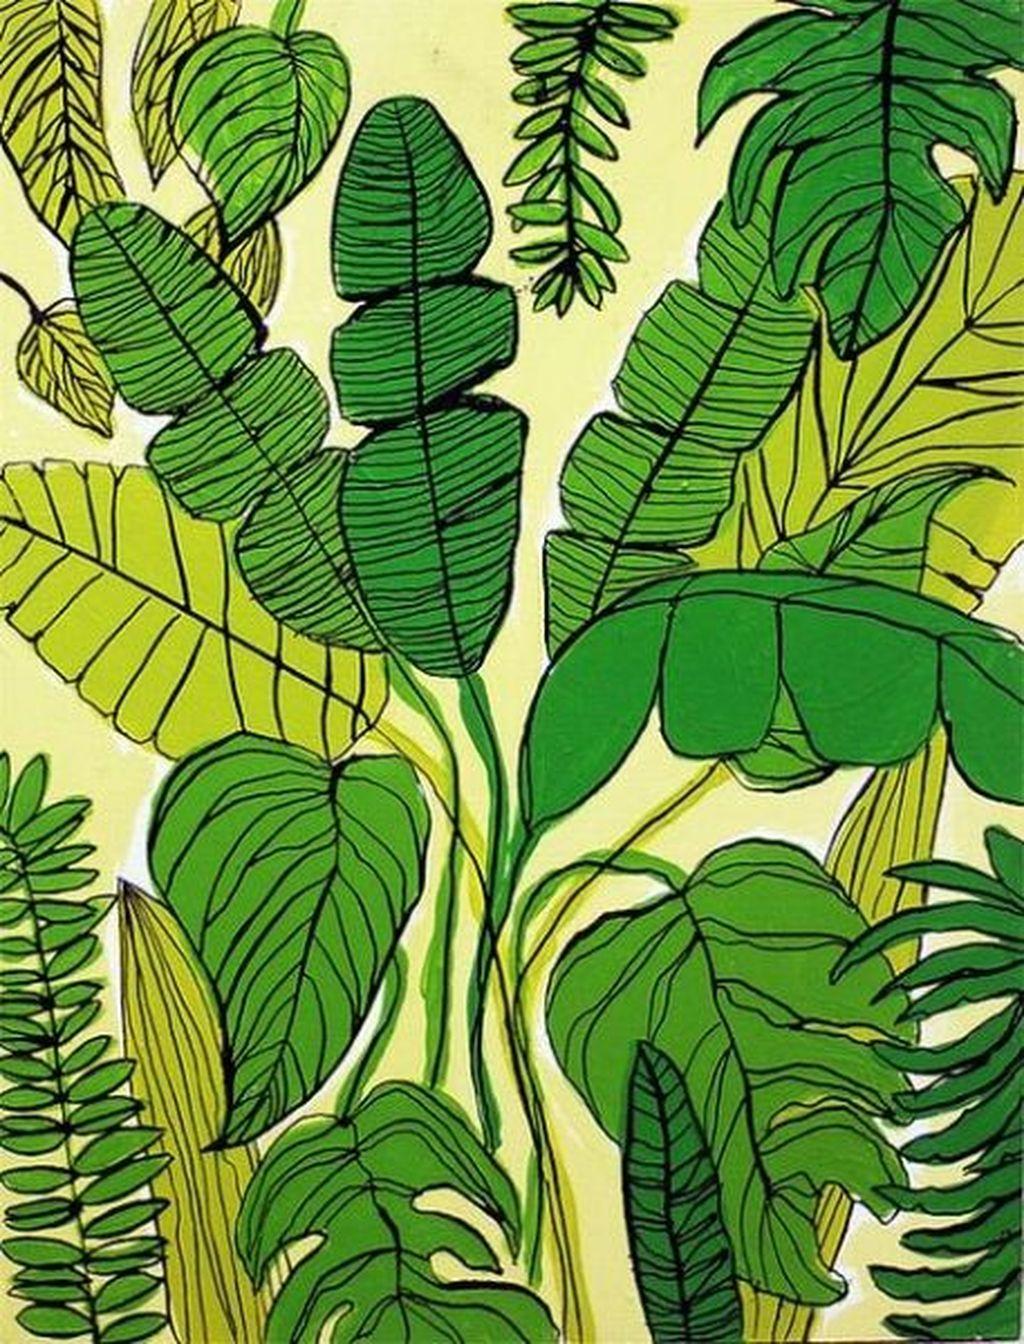 Splendid Tropical Leaf Decor Ideas For Home Design 20